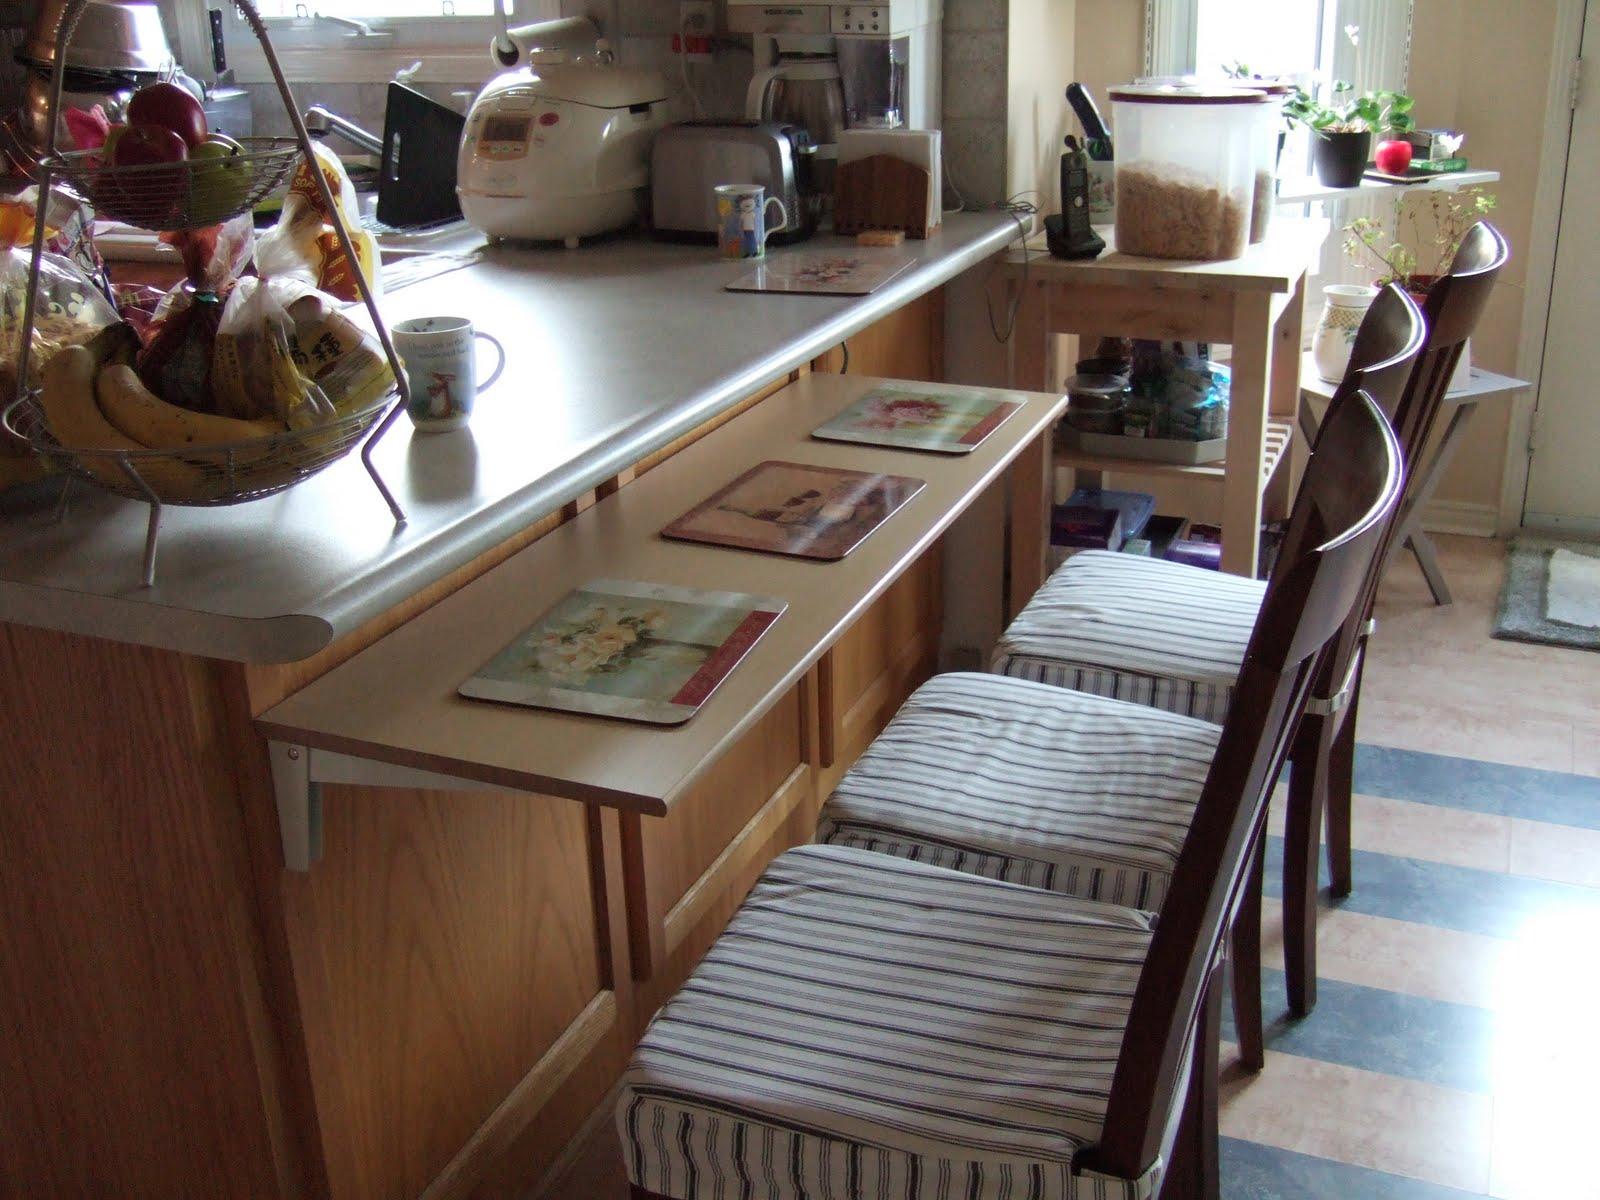 Olive Flower: 간이 테이블 만들기